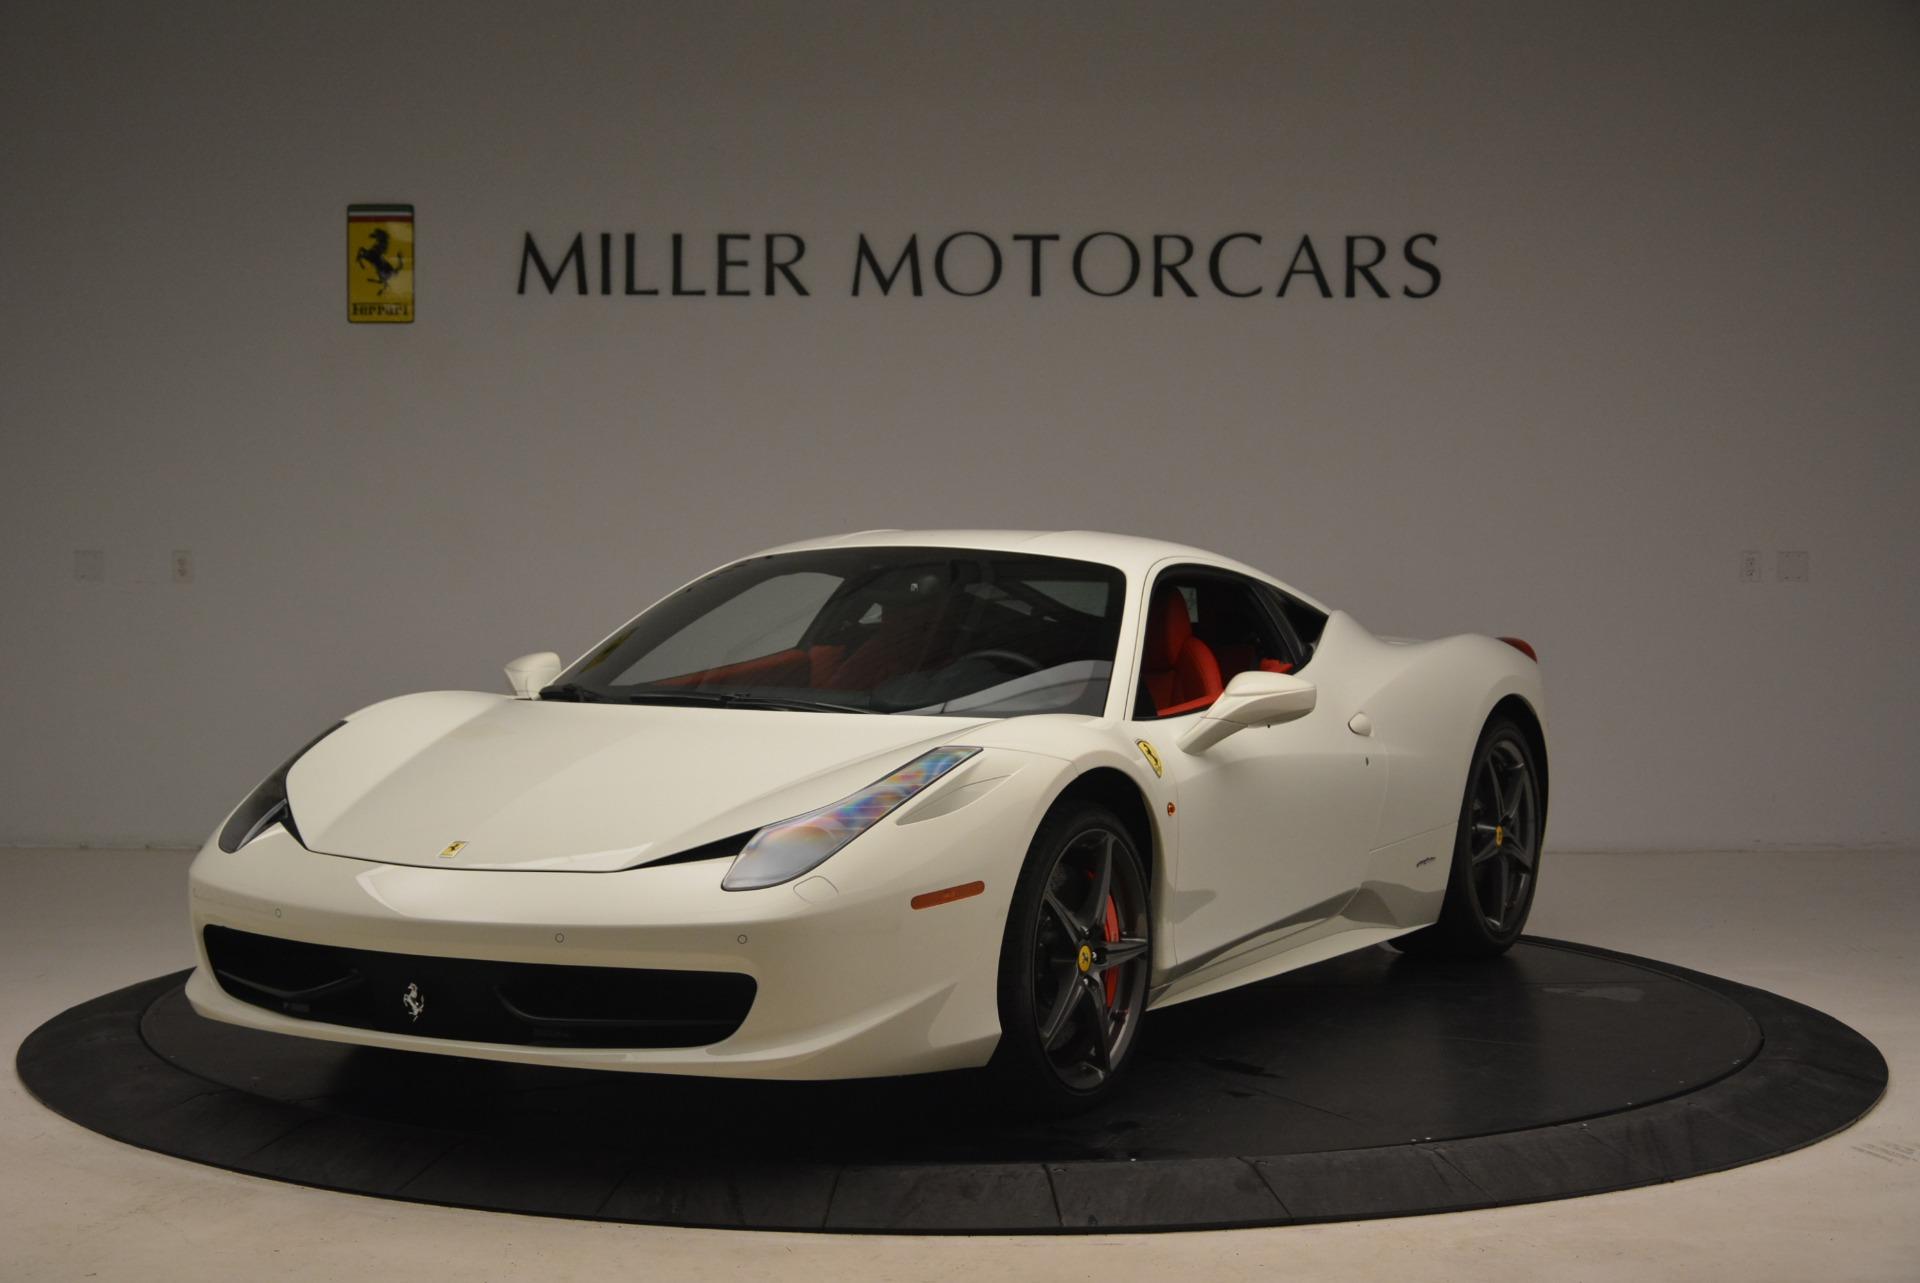 Used 2014 Ferrari 458 Italia for sale Sold at Rolls-Royce Motor Cars Greenwich in Greenwich CT 06830 1